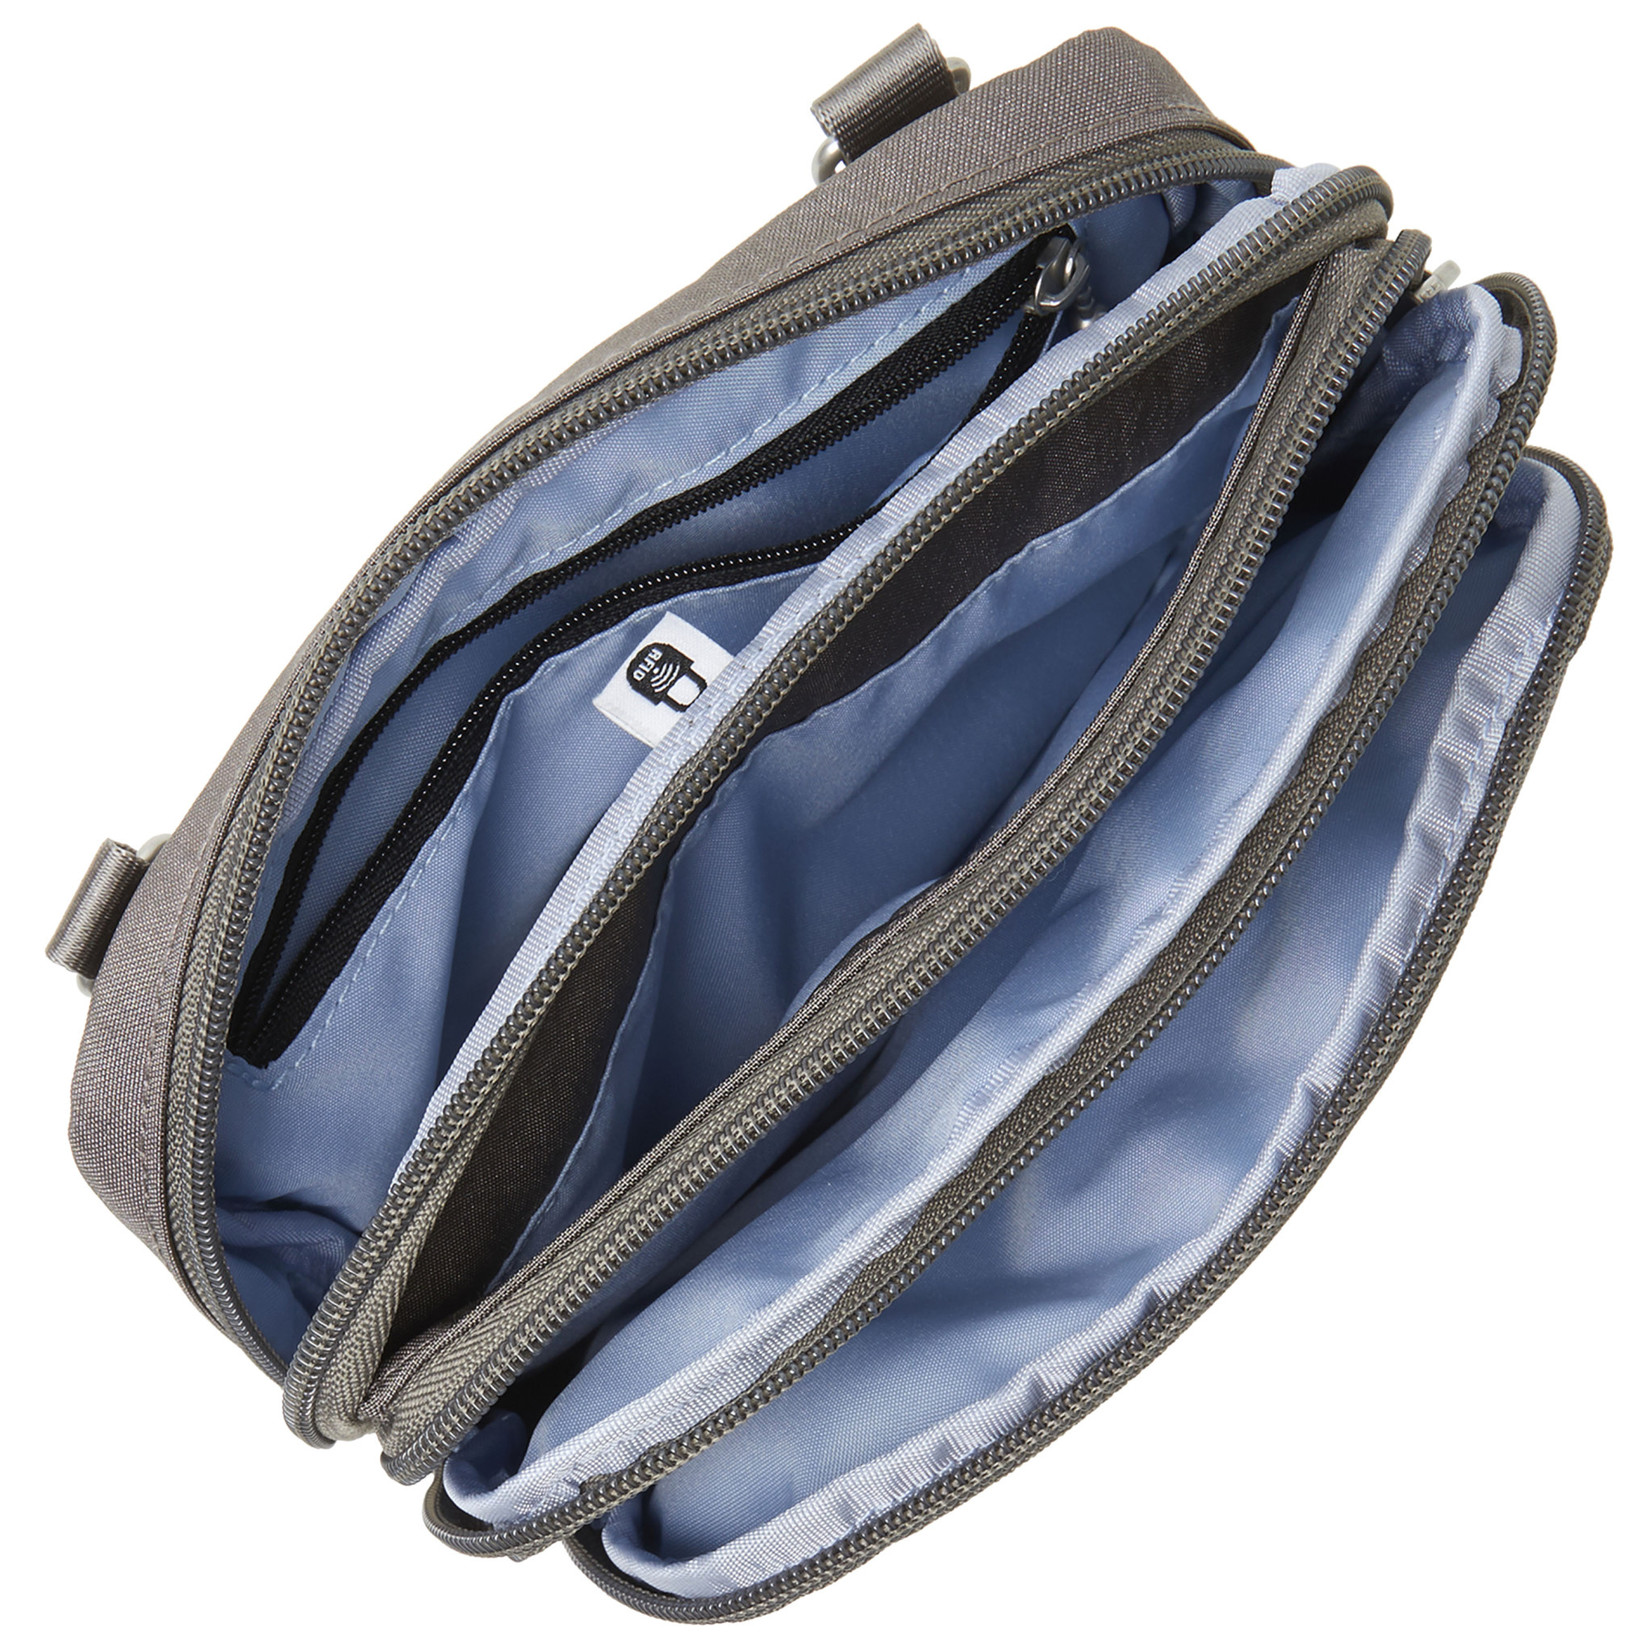 Baggallini Time Zone RFID Crossbody Bag - Sterling Shimmer